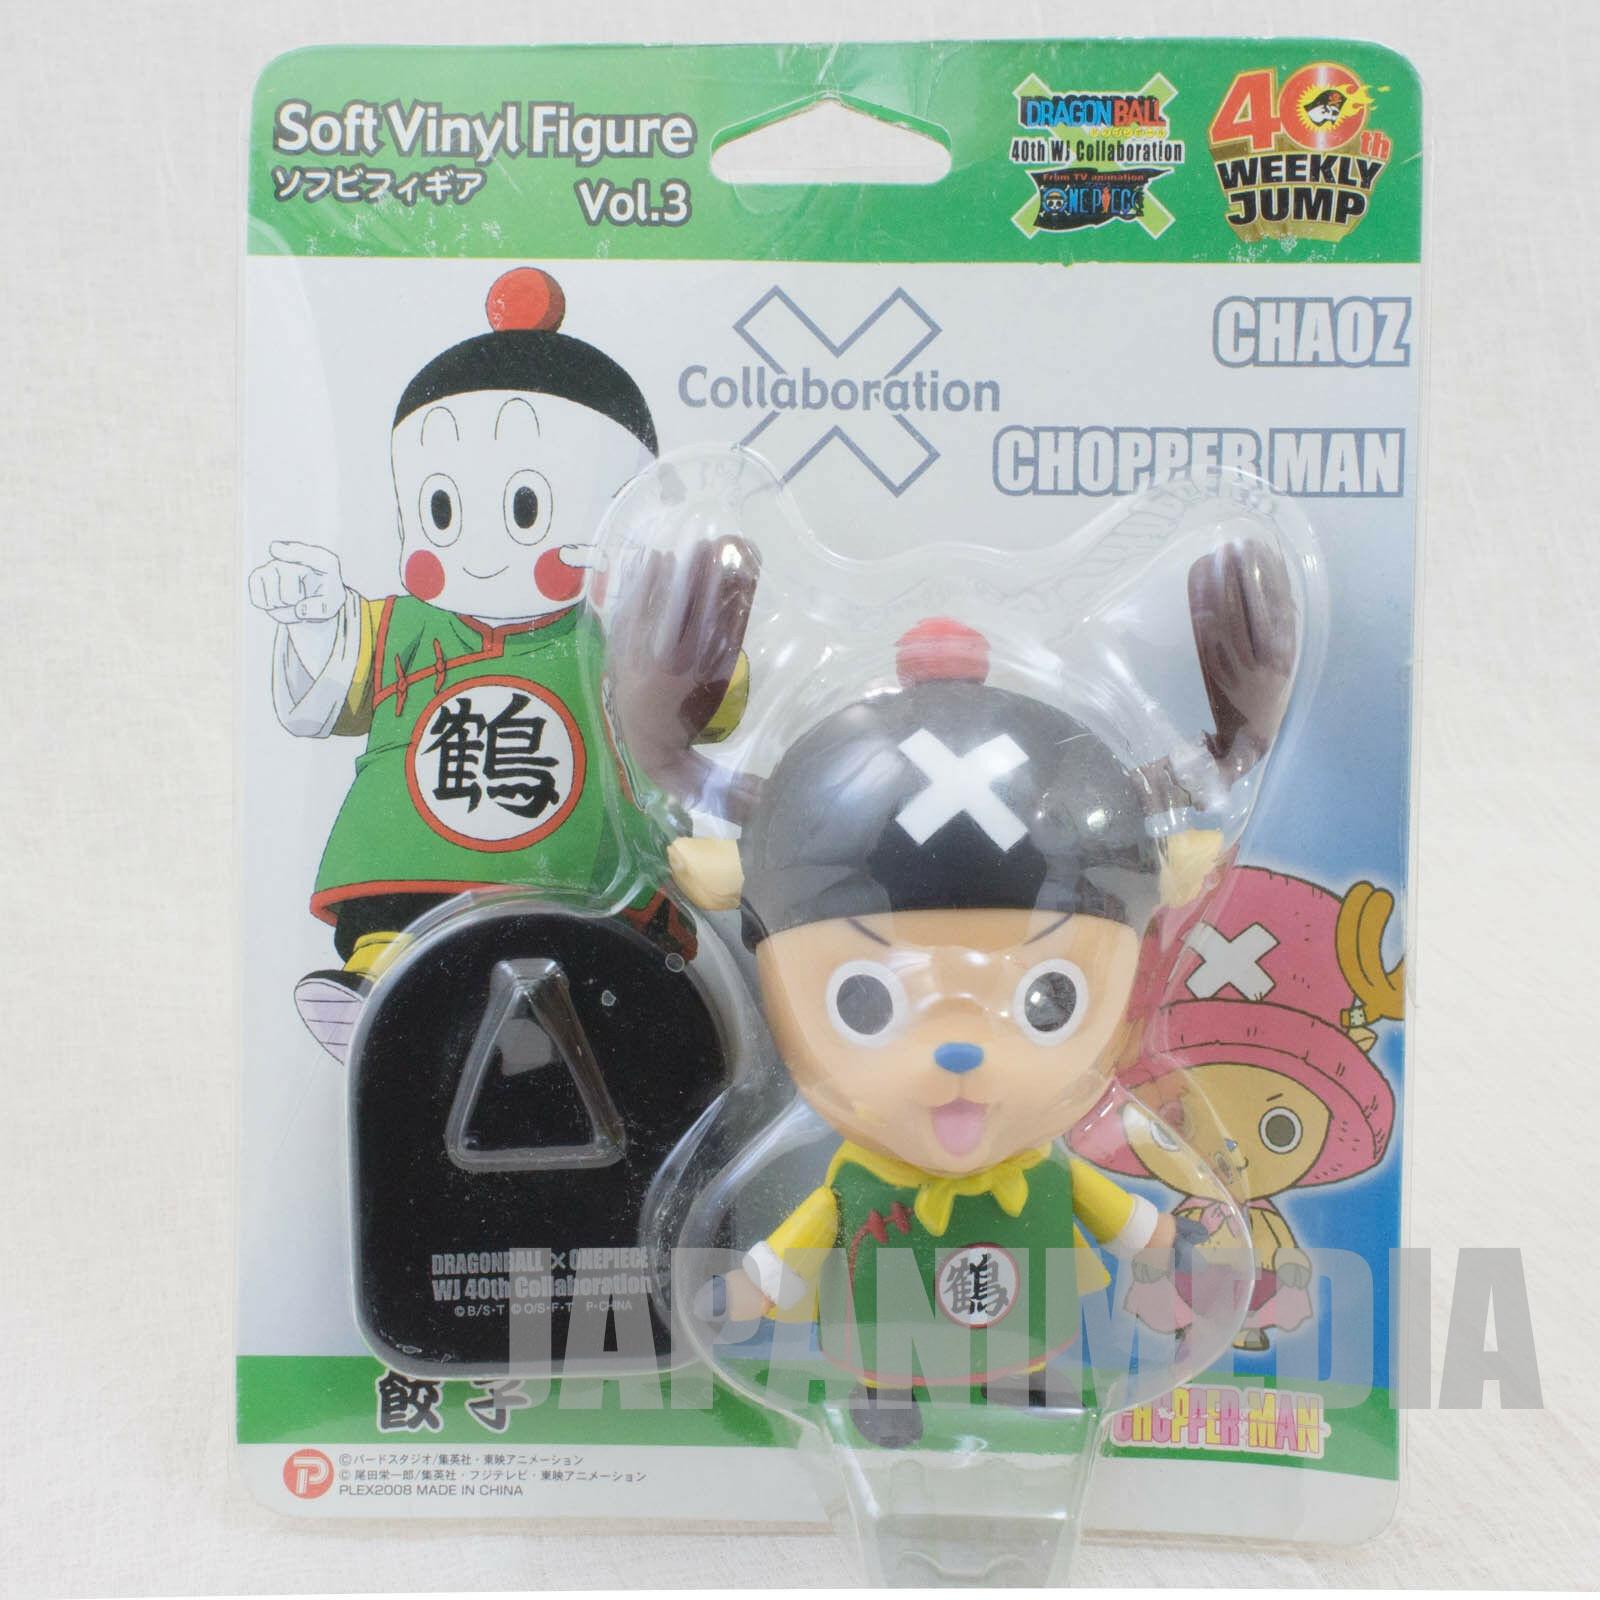 Dragon Ball Z x One Piece Sofubi Figure Chopper Man x Chaoz JAPAN ANIME